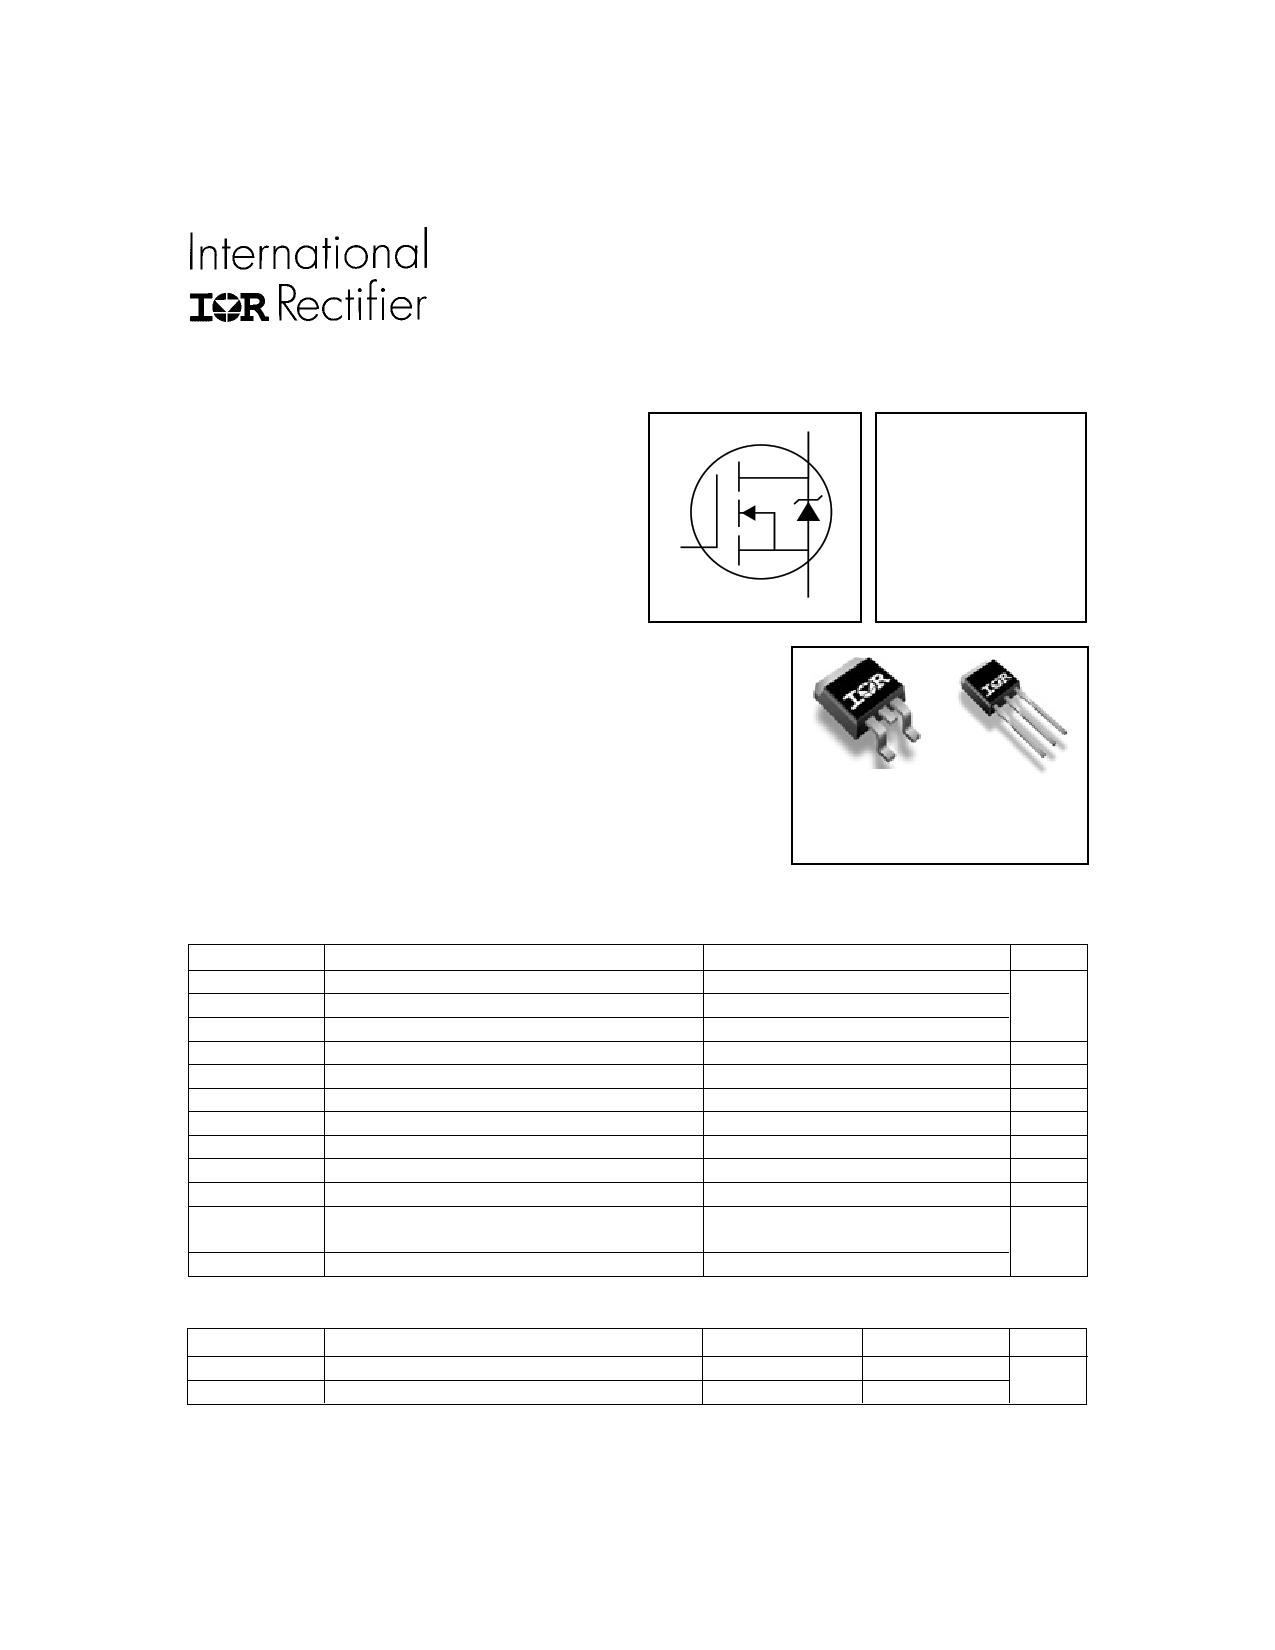 IRFZ44VS Datasheet, IRFZ44VS PDF,ピン配置, 機能